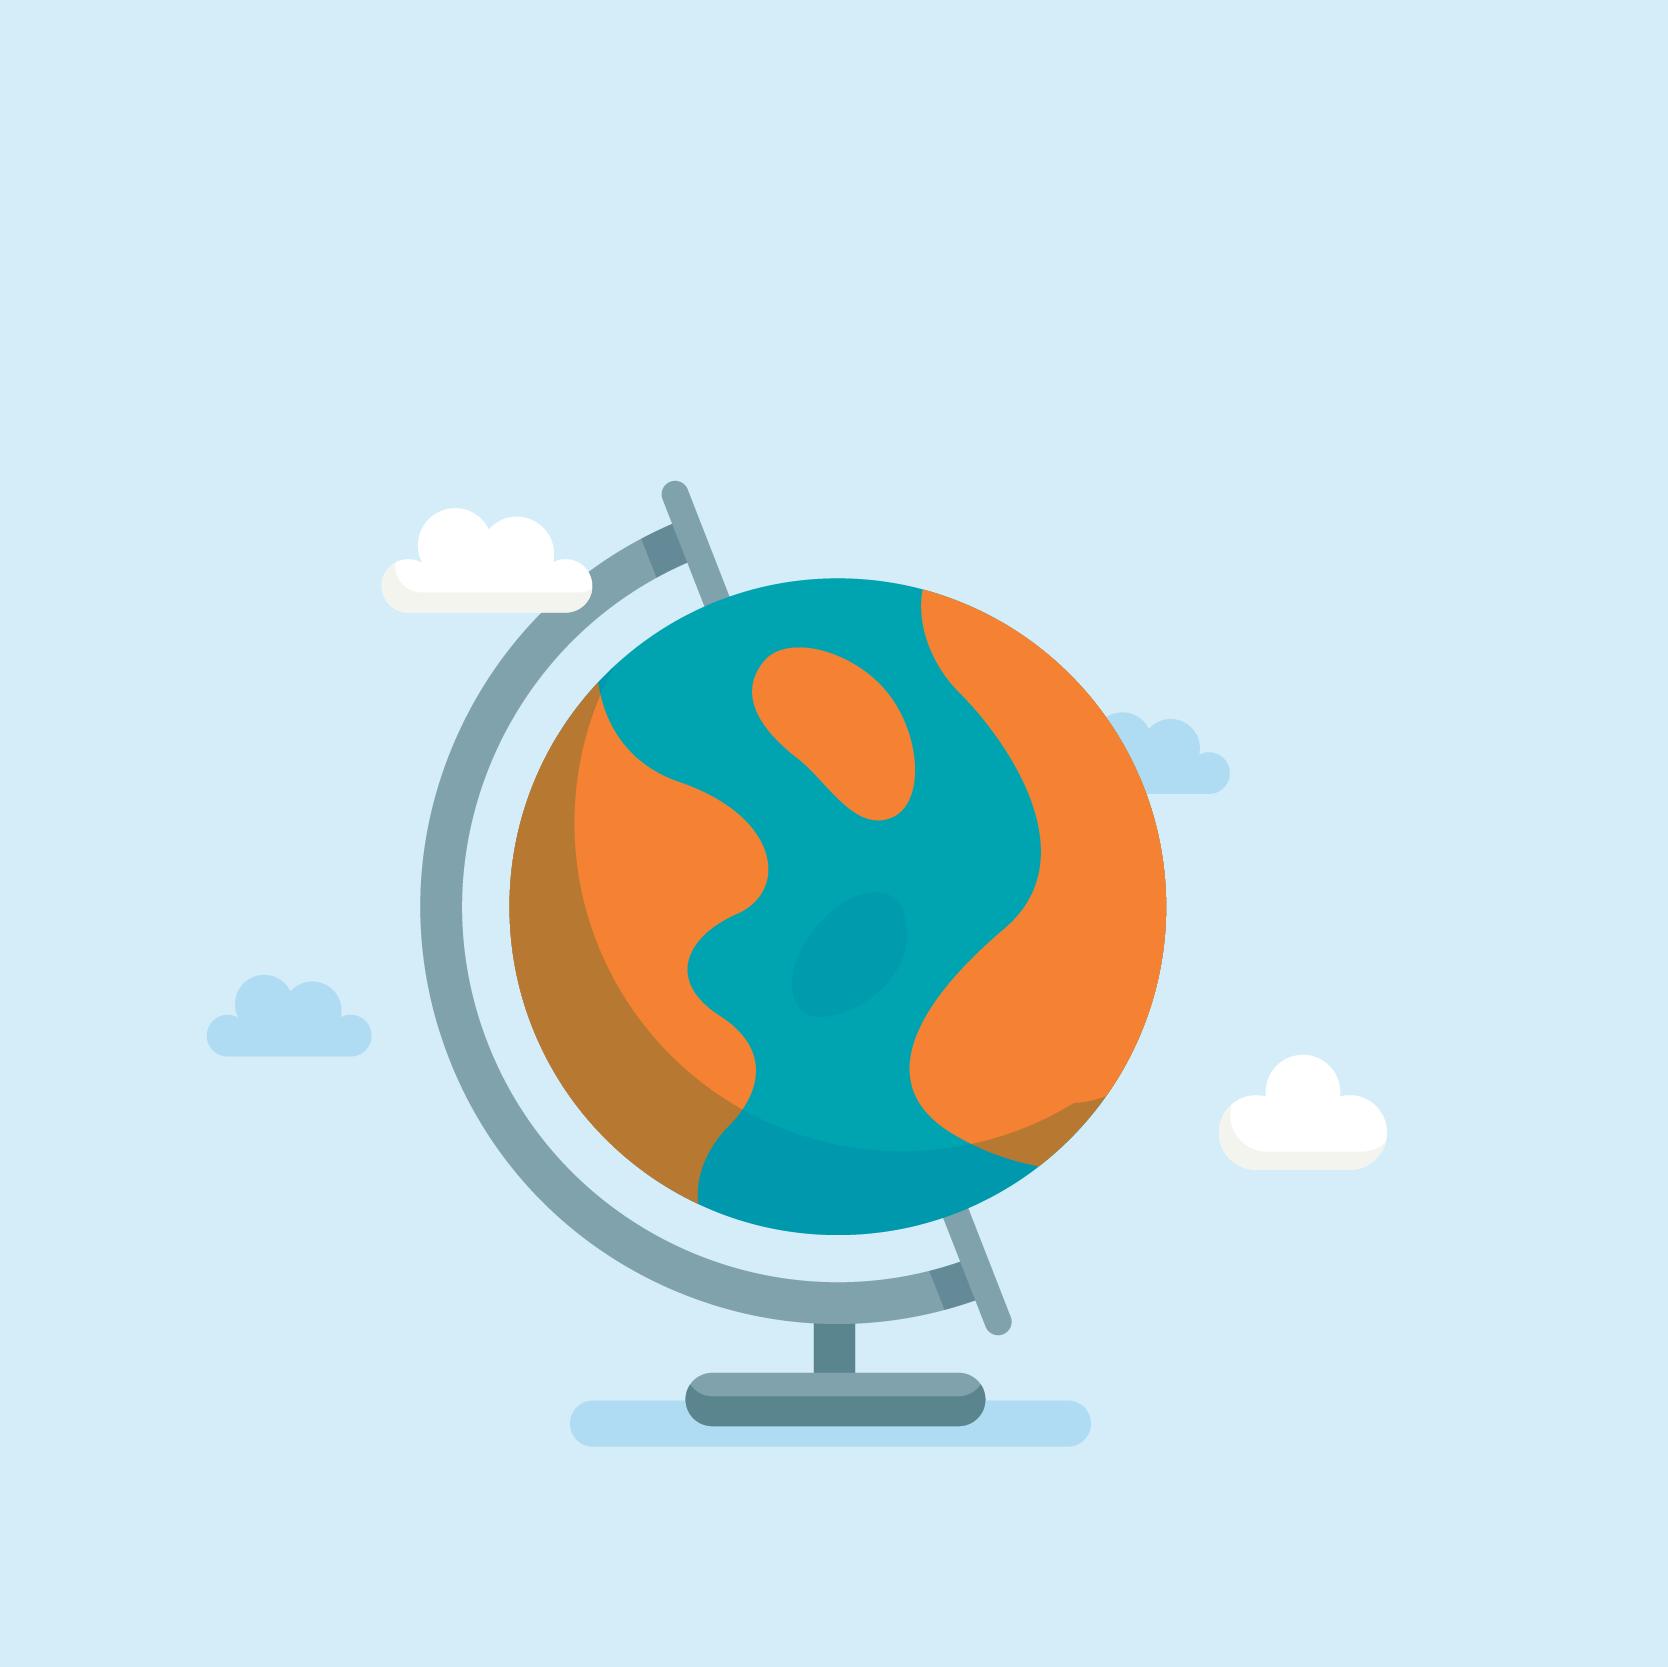 Poacher globe